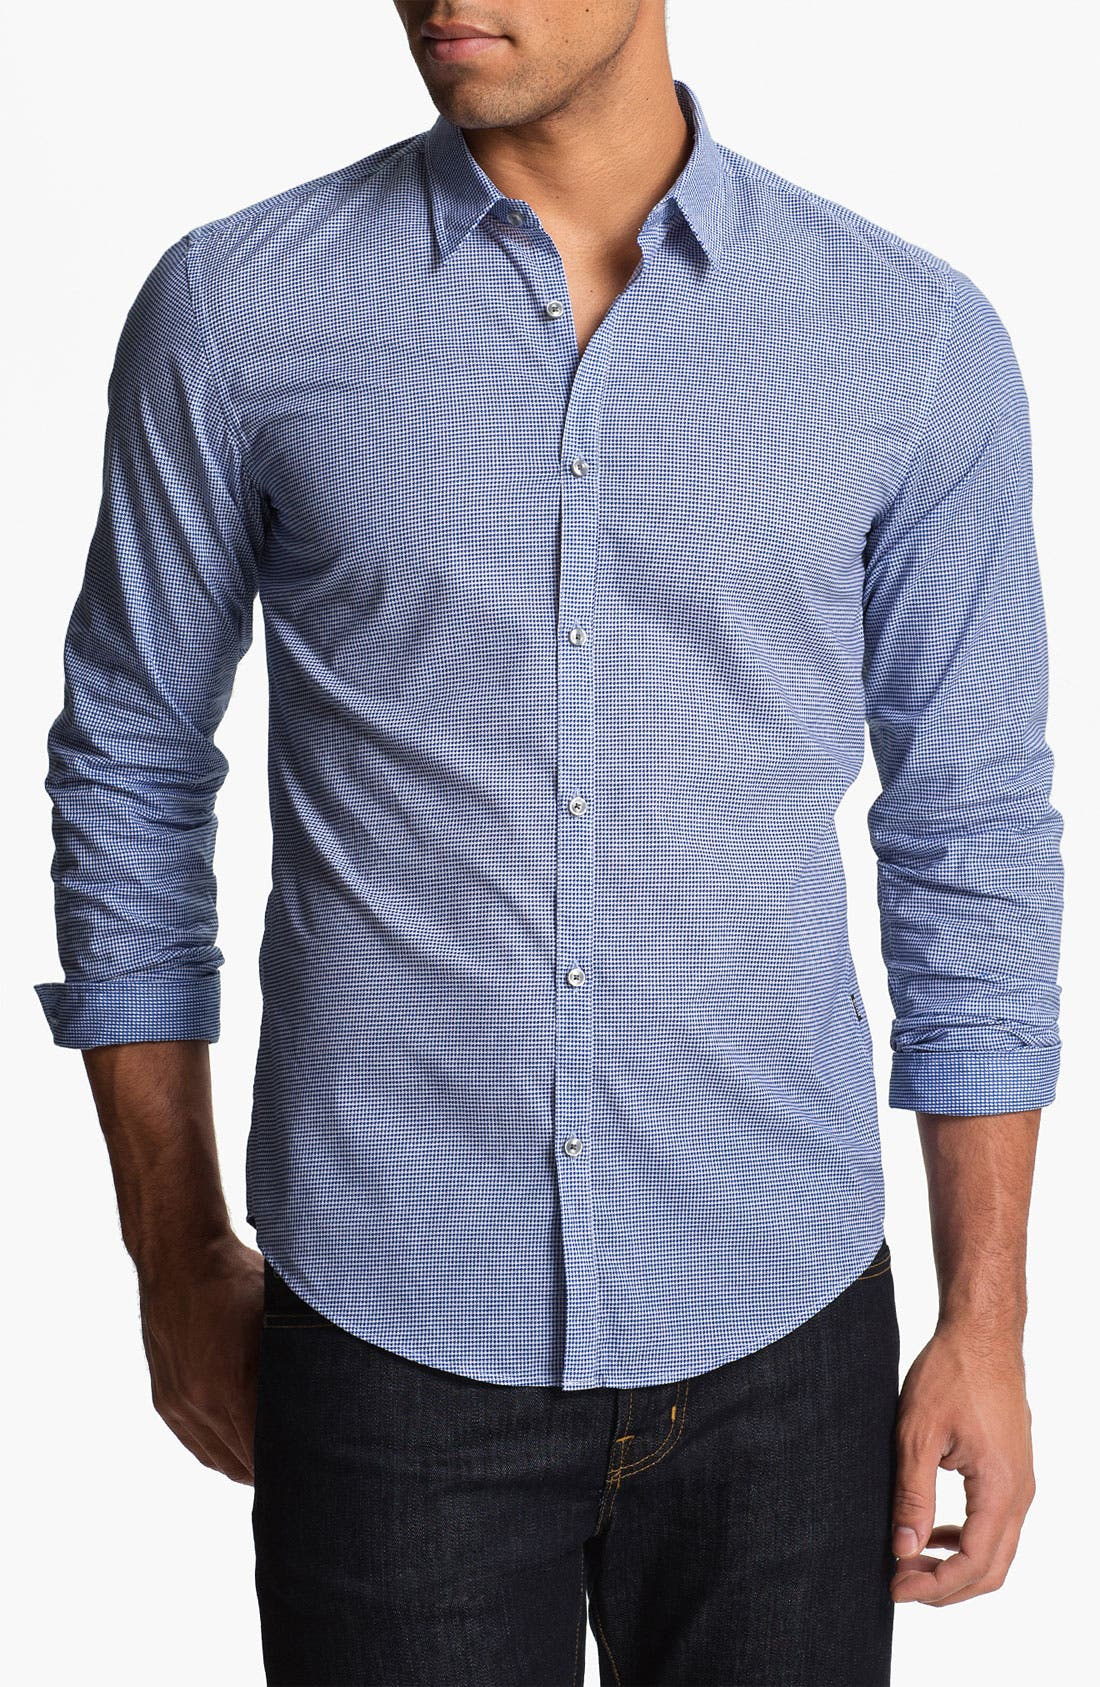 Alternate Image 1 Selected - BOSS Black 'Remus' Slim Fit Sport Shirt